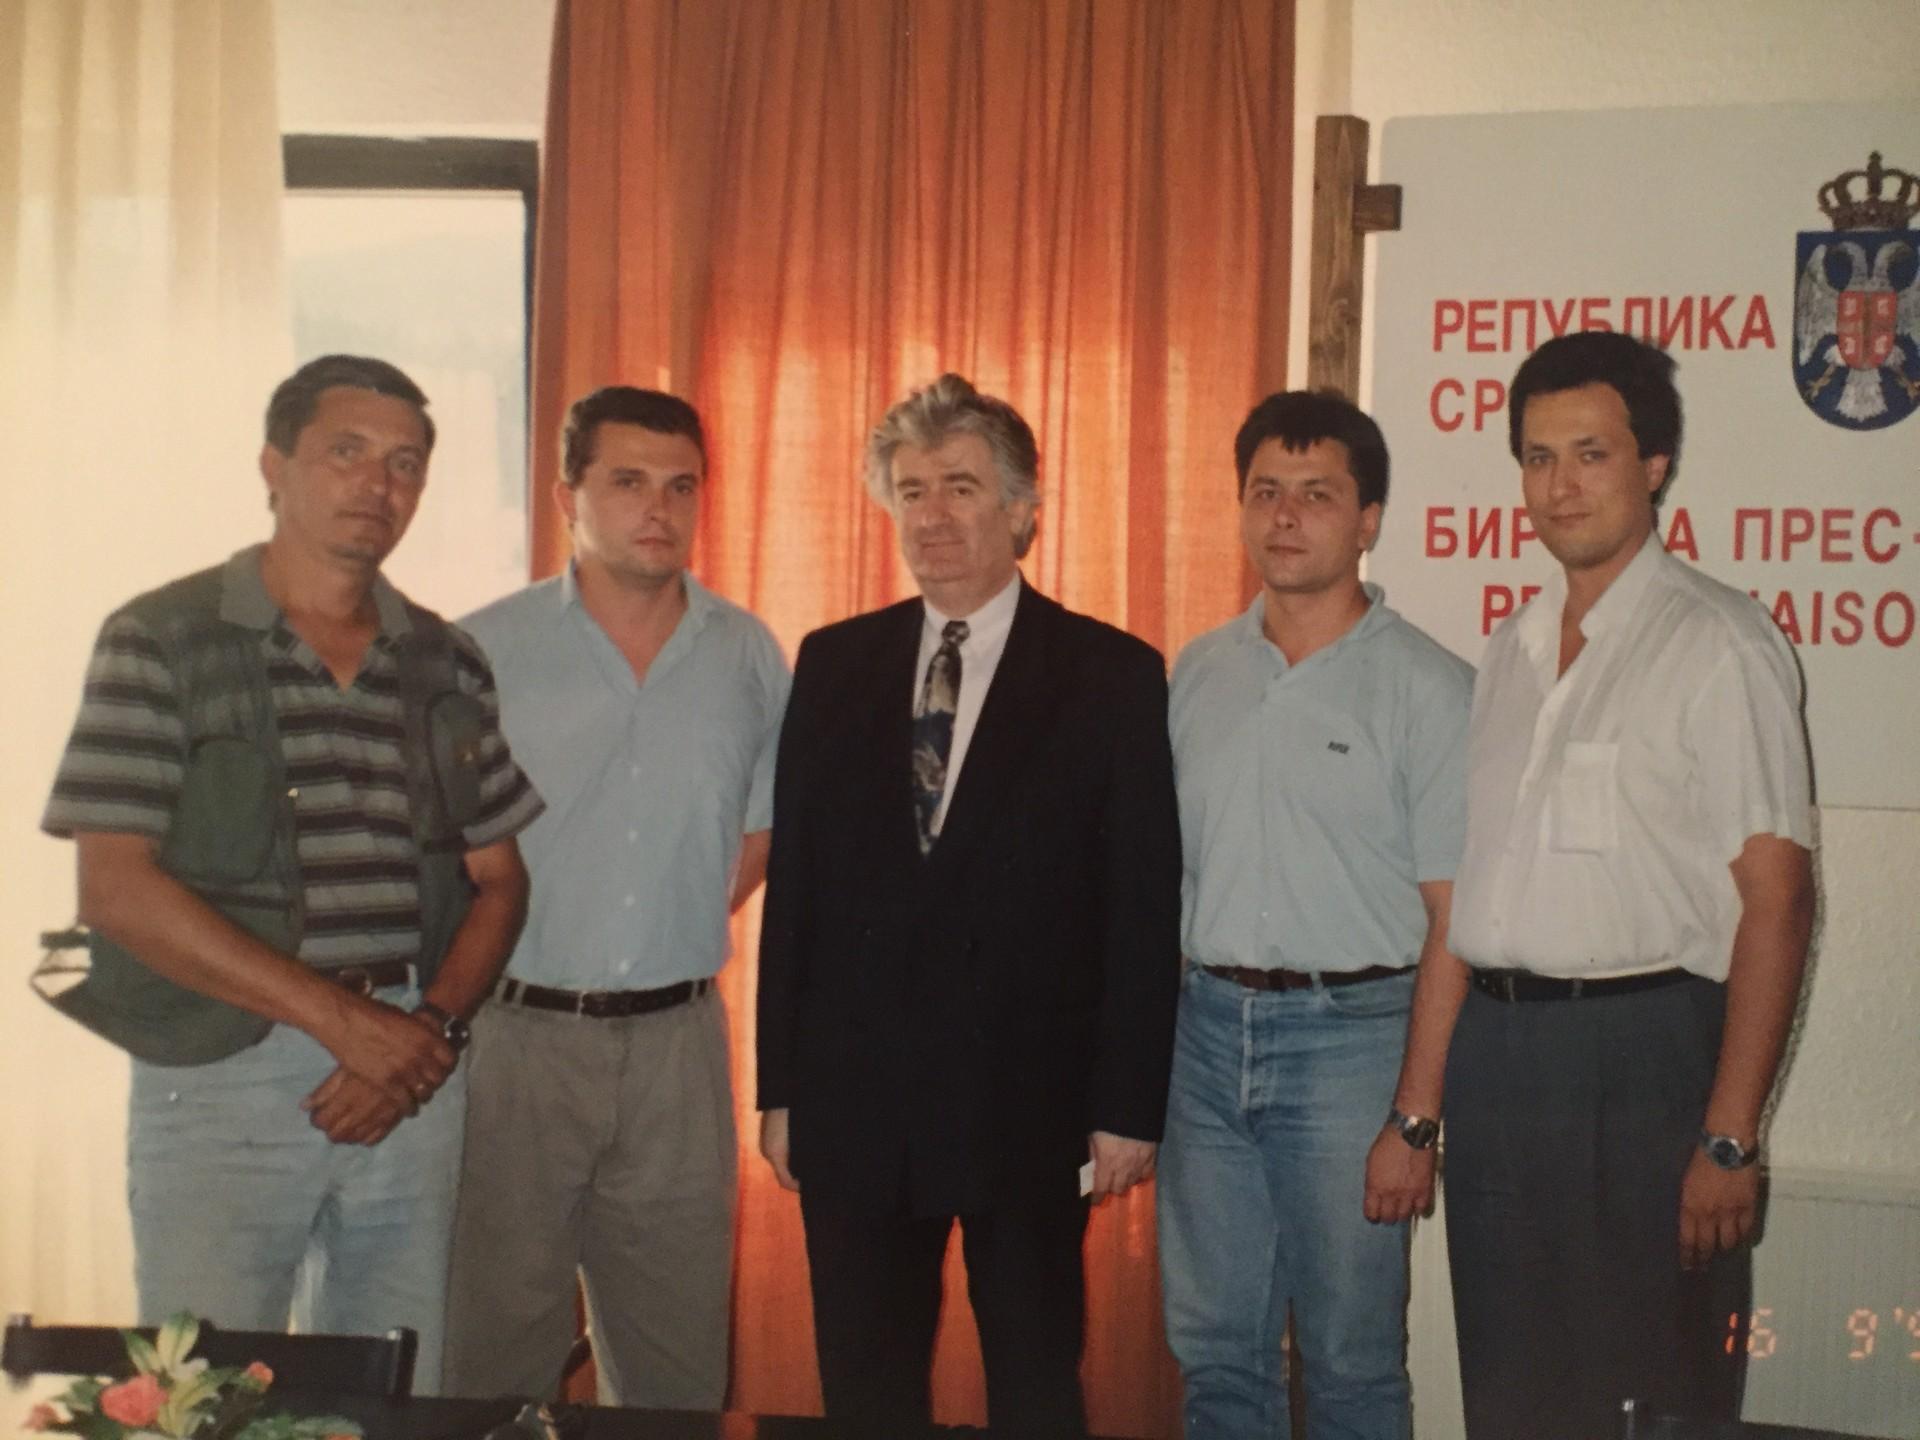 А. Кљан, В. Соловјов, Р. Караџић, А. Батурин, И. Иванов